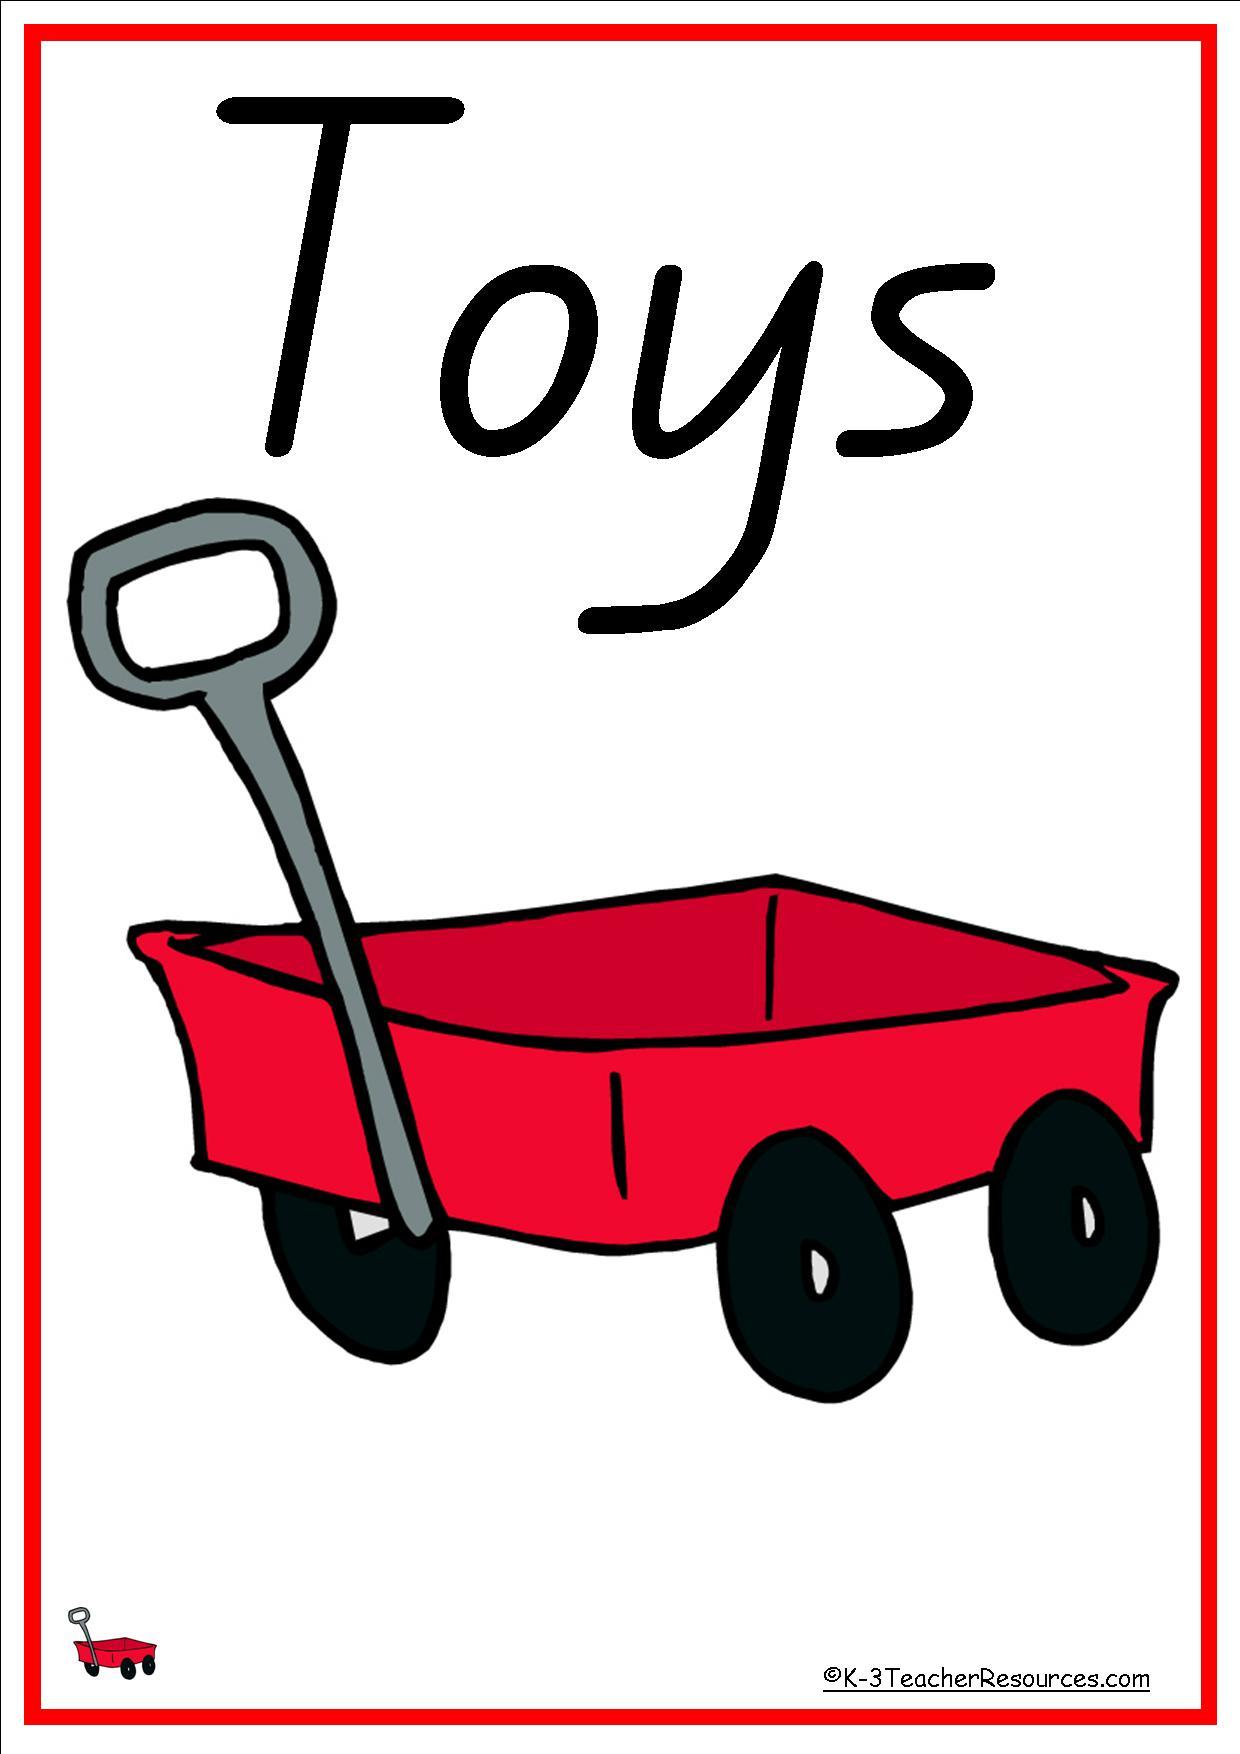 40 Toys Vocabulary Words